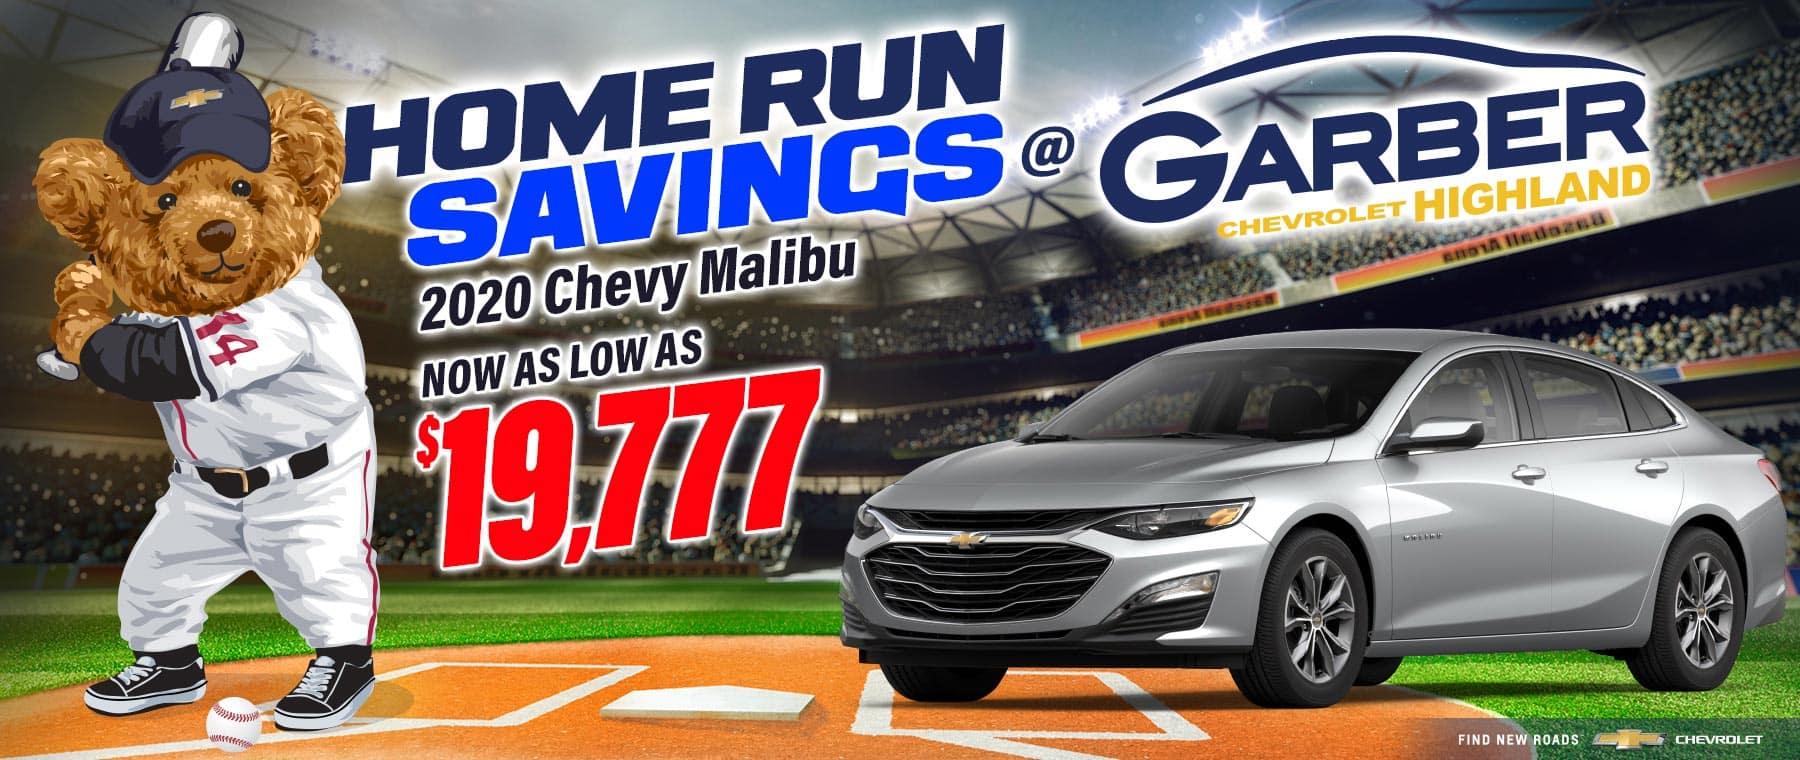 2020 Chevy Malibu - as low as $19,777